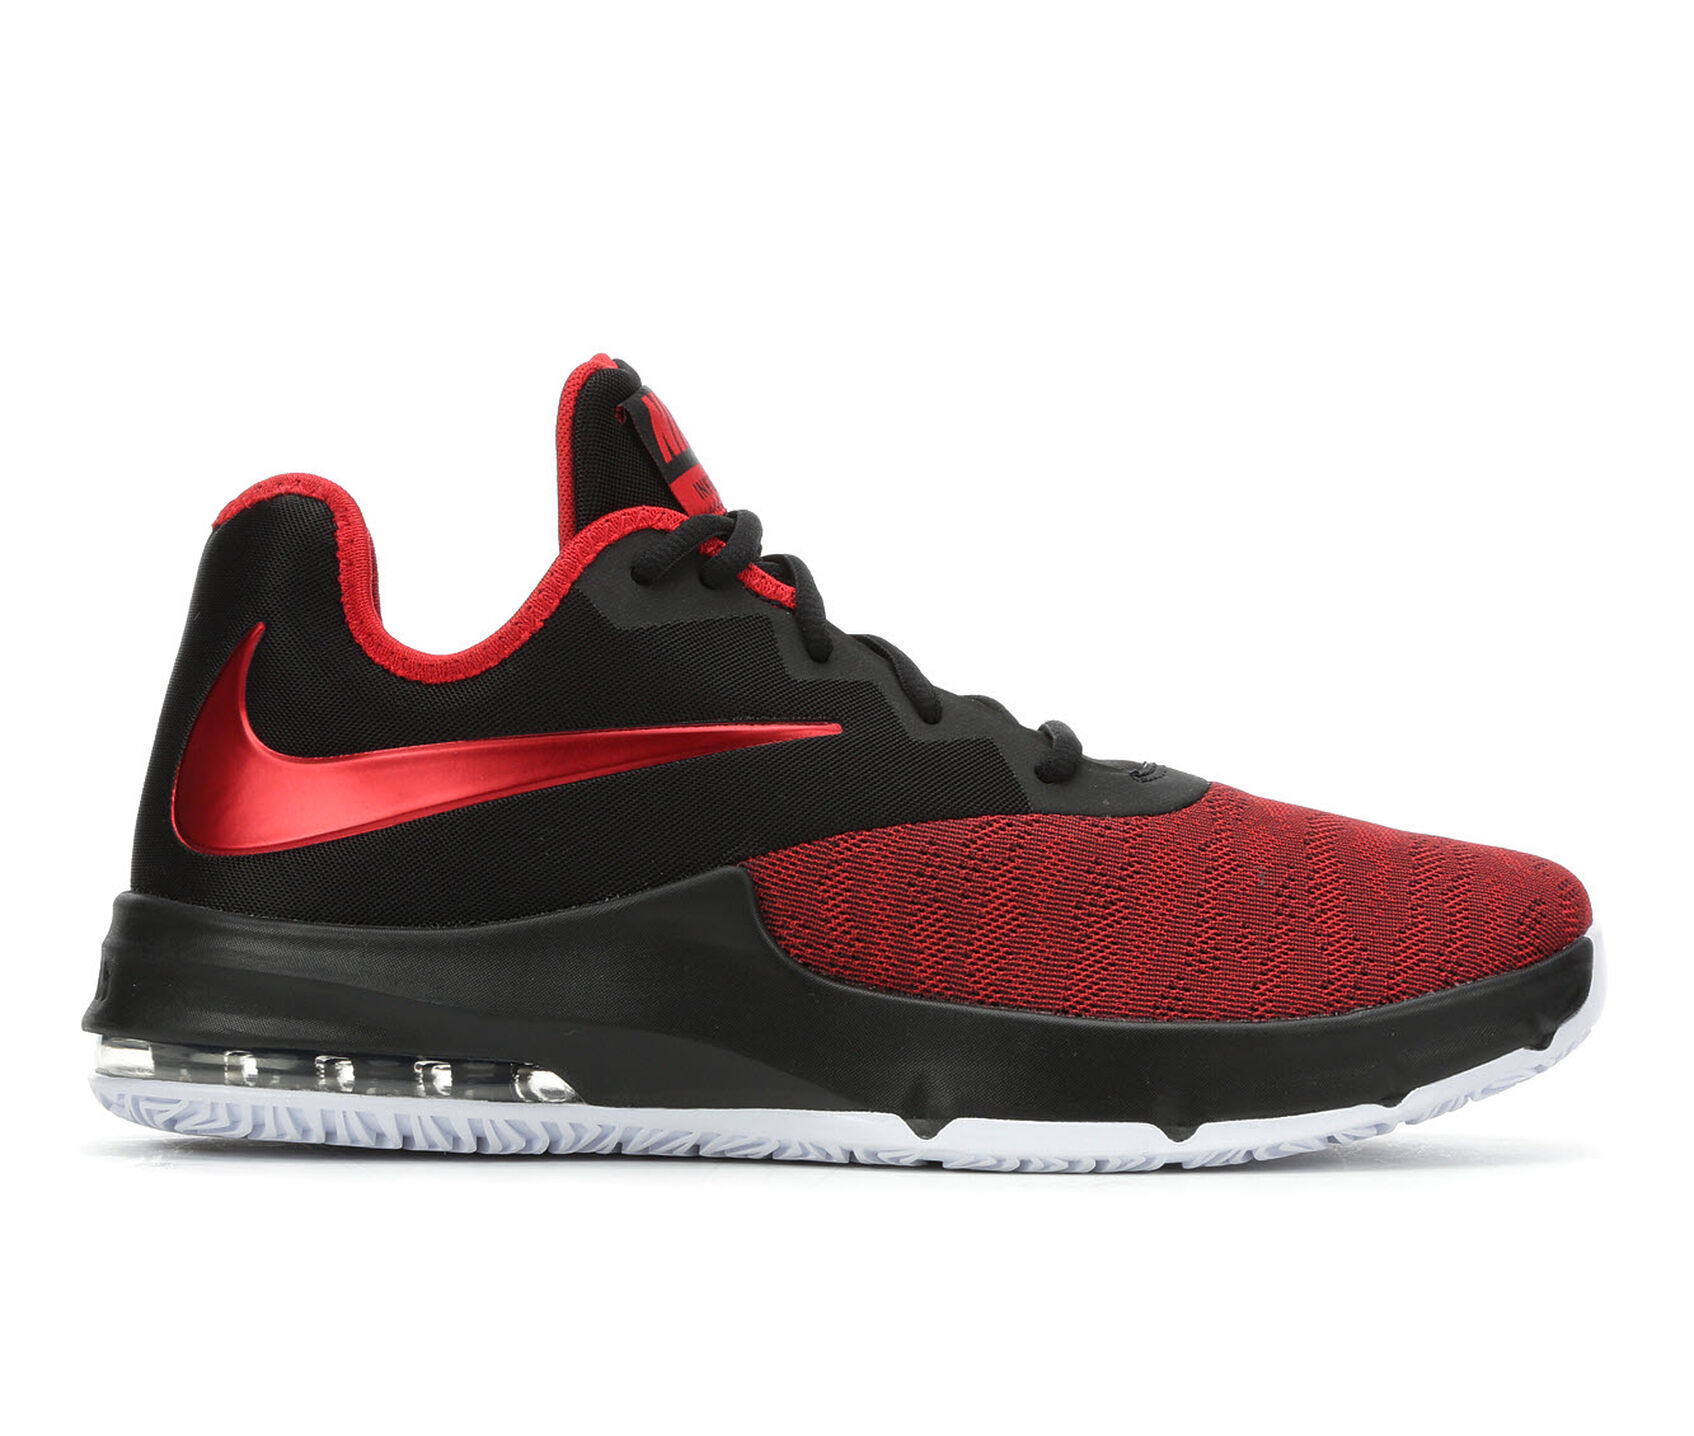 69fe3cf2a5f92c Men's Nike Air Max Infuriate III Low Basketball Shoes | Shoe Carnival